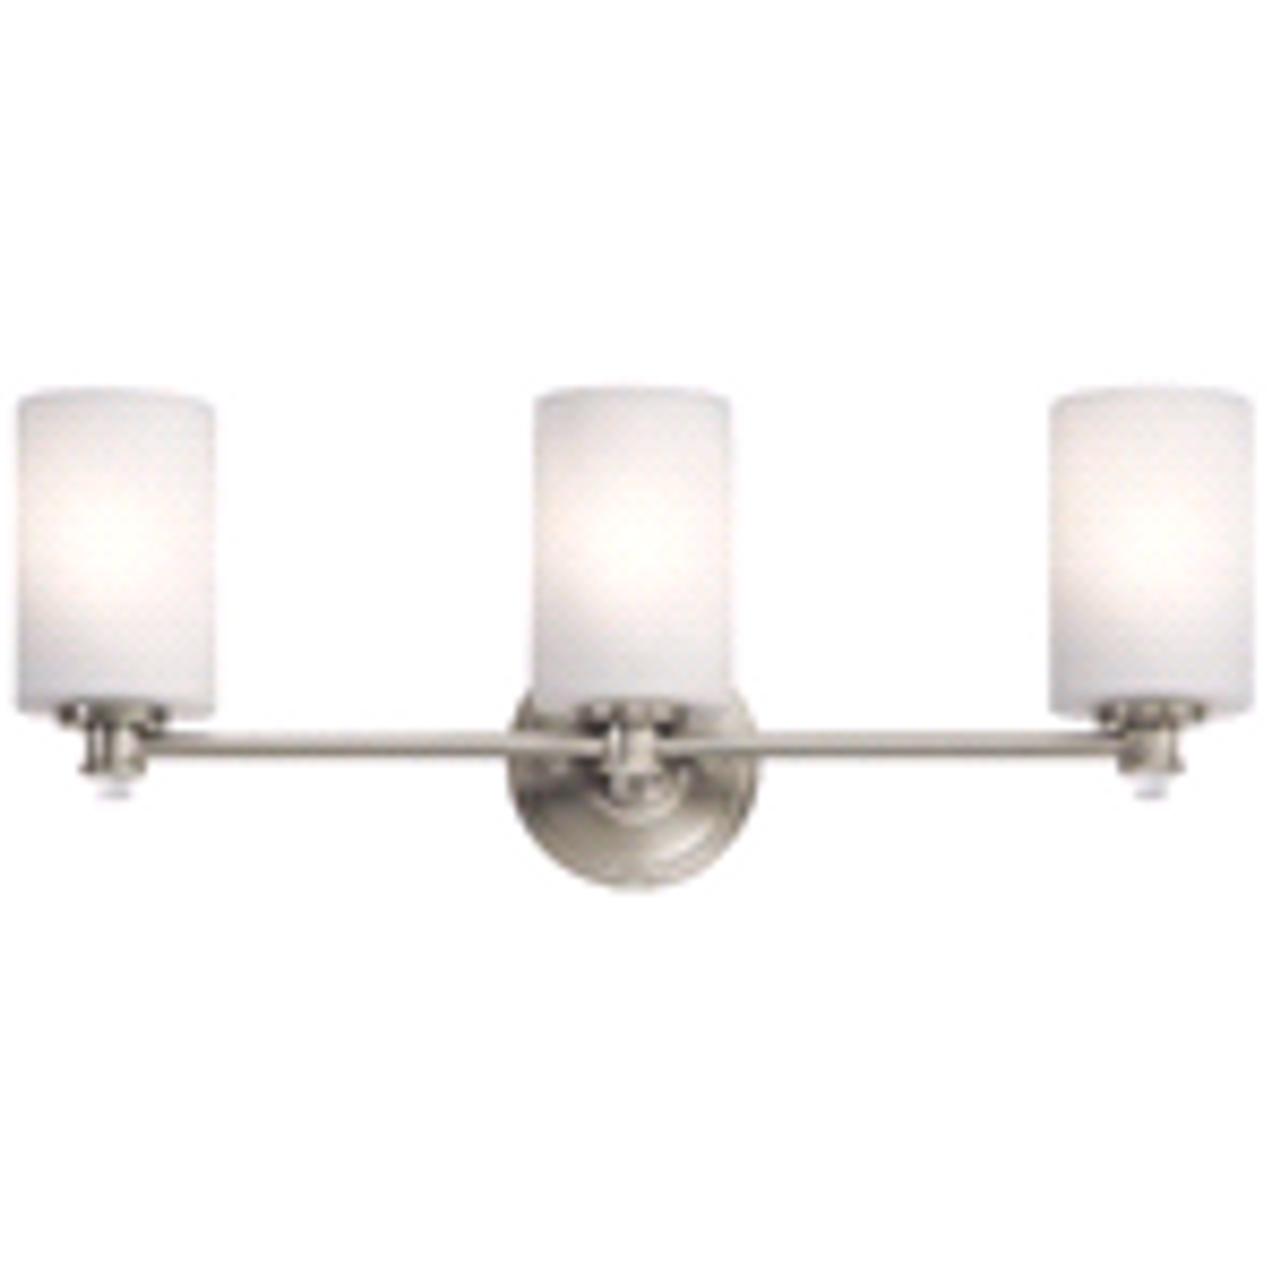 Kichler Joelson | 3-Light Vanity Fixture | Brushed Nickel | 783927491631